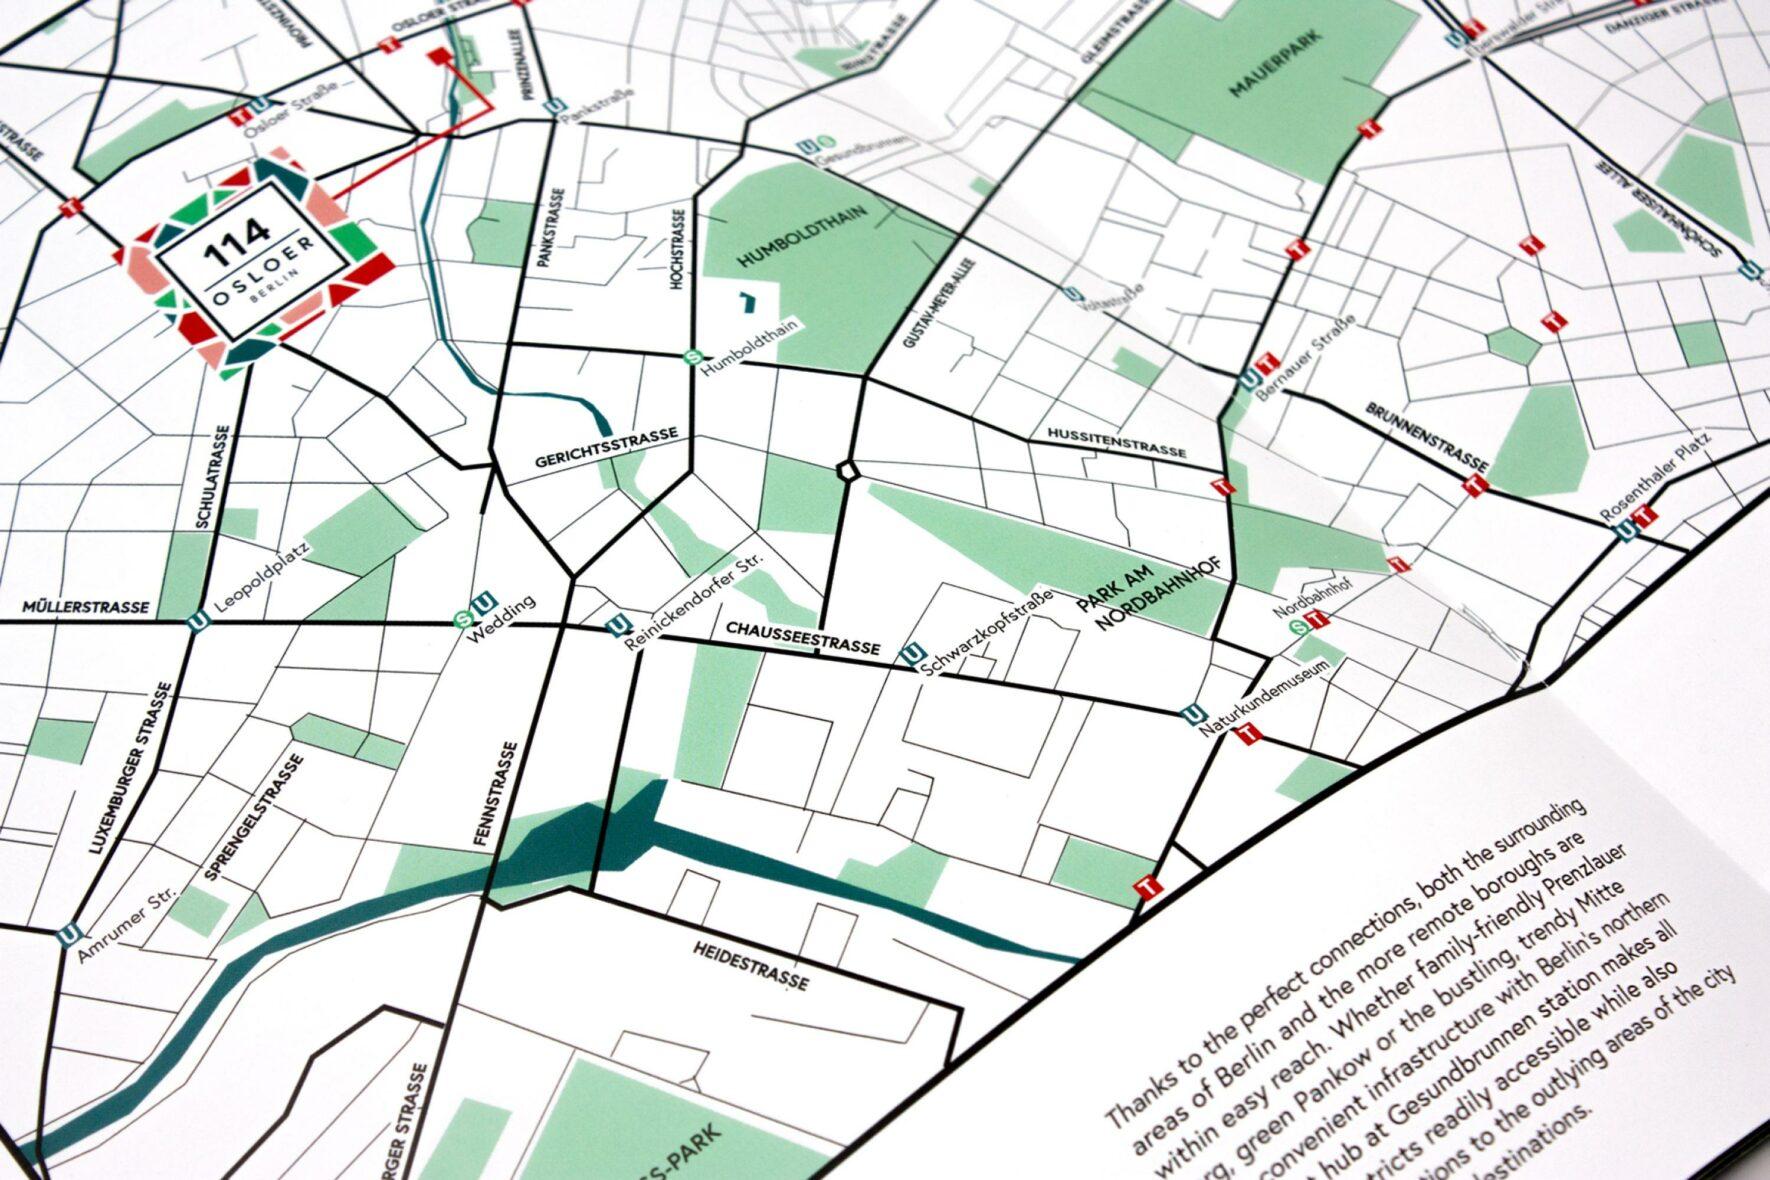 Broschuere-Osloer-Immobilienbranding-Trendcity-FORMLOS-berlin-11